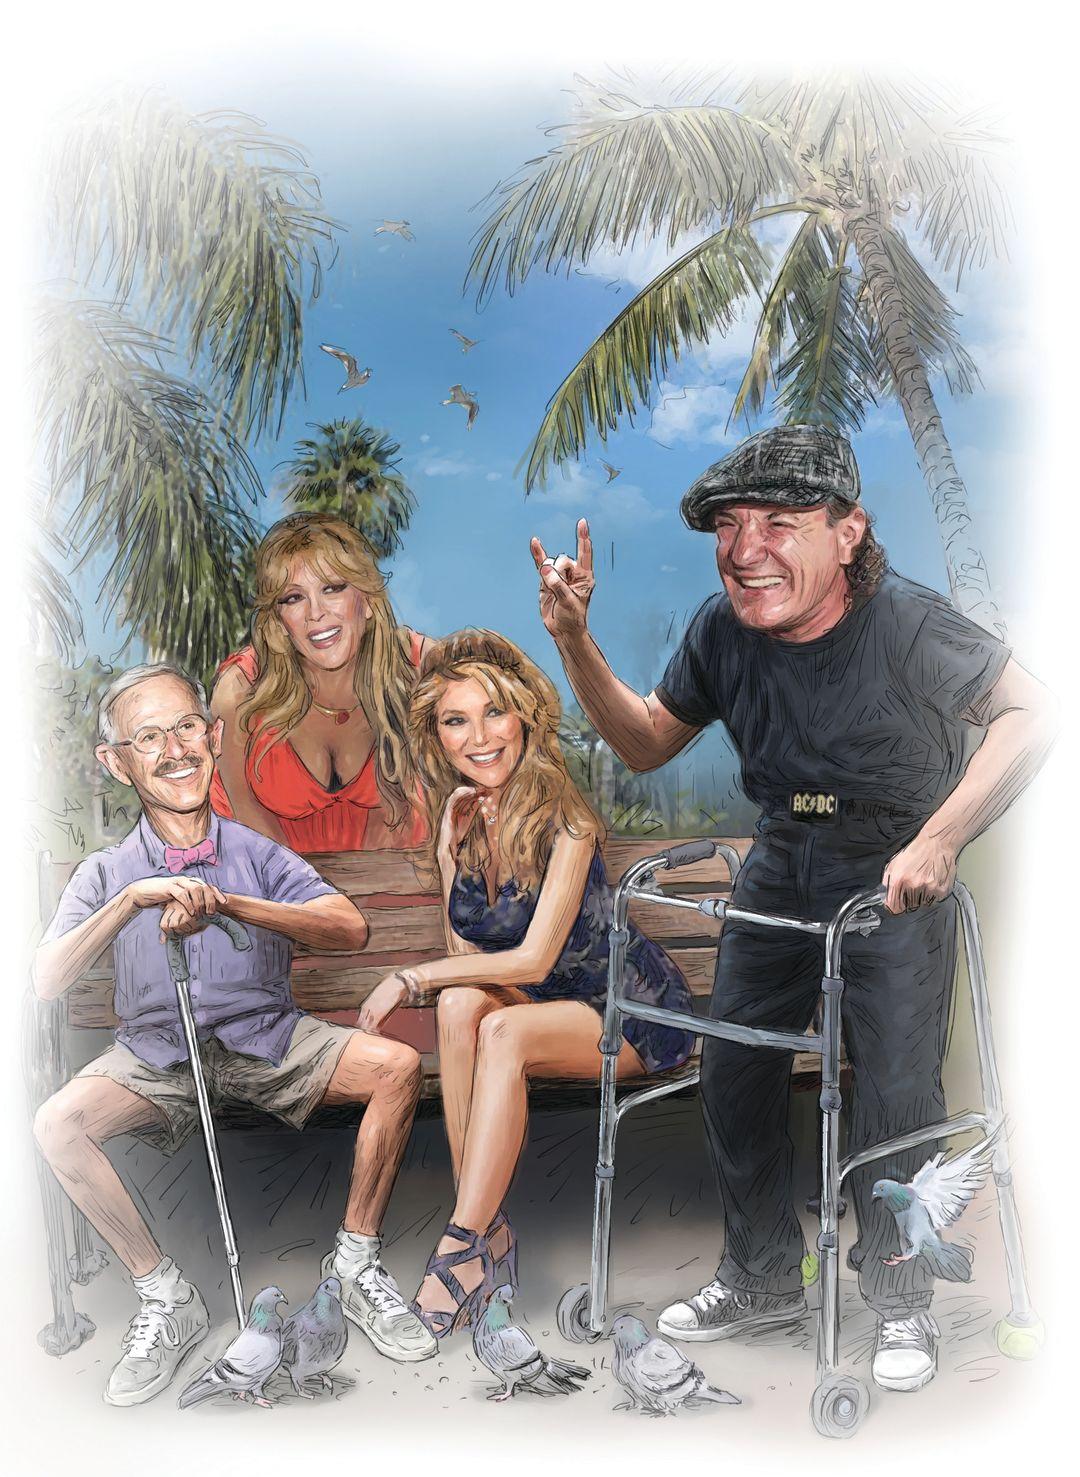 Sarasota mag.  ad gigi ortwein.  old celebrities final 2 yjrzmq